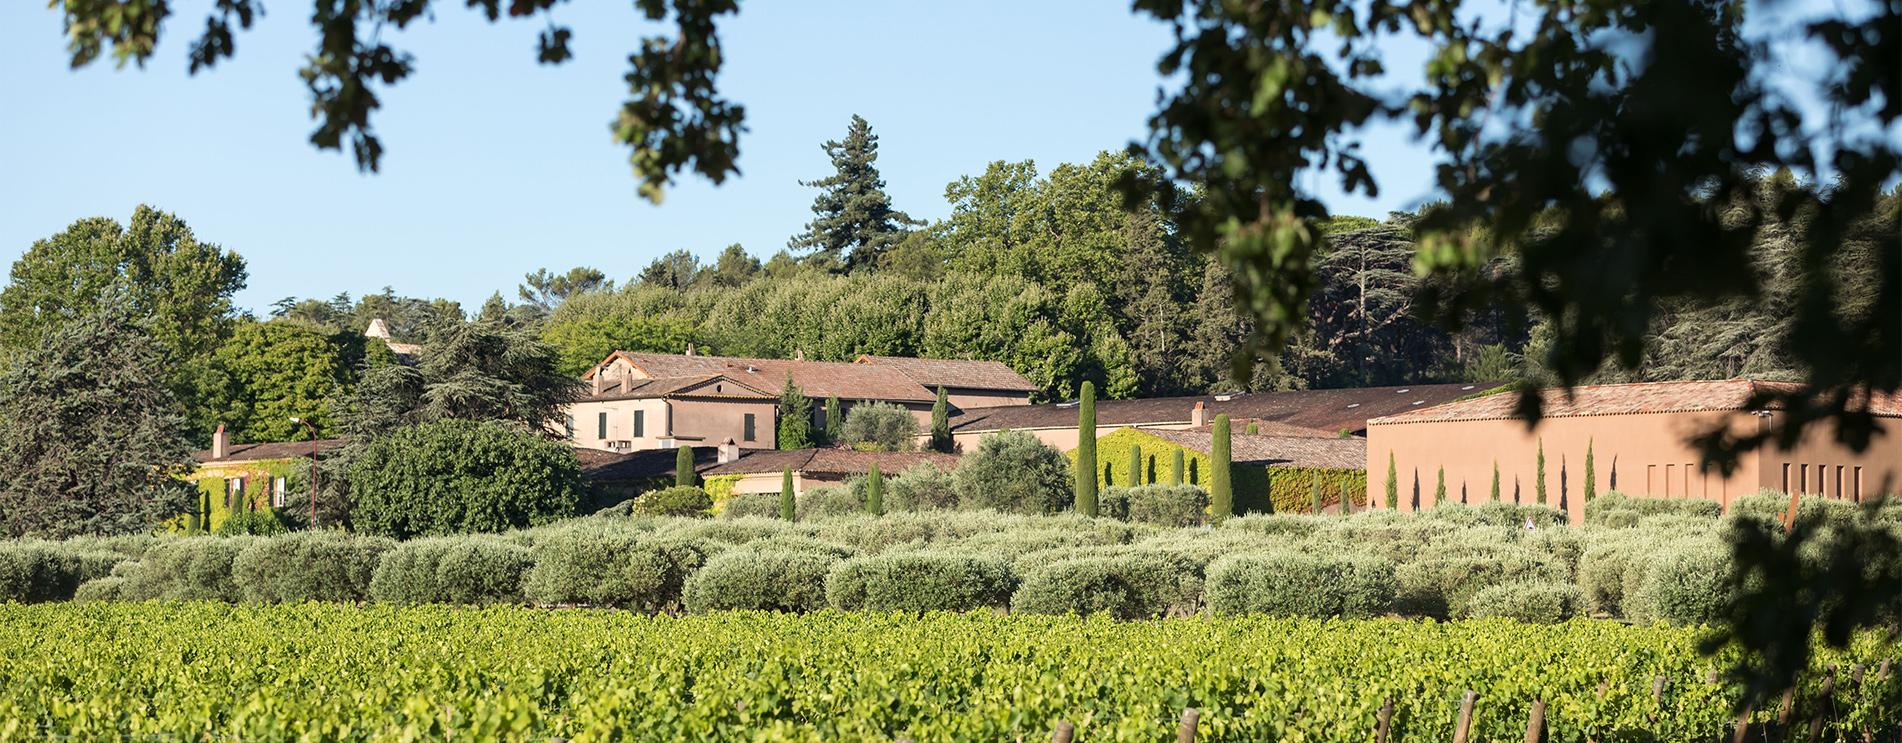 Roseline vineyard photo